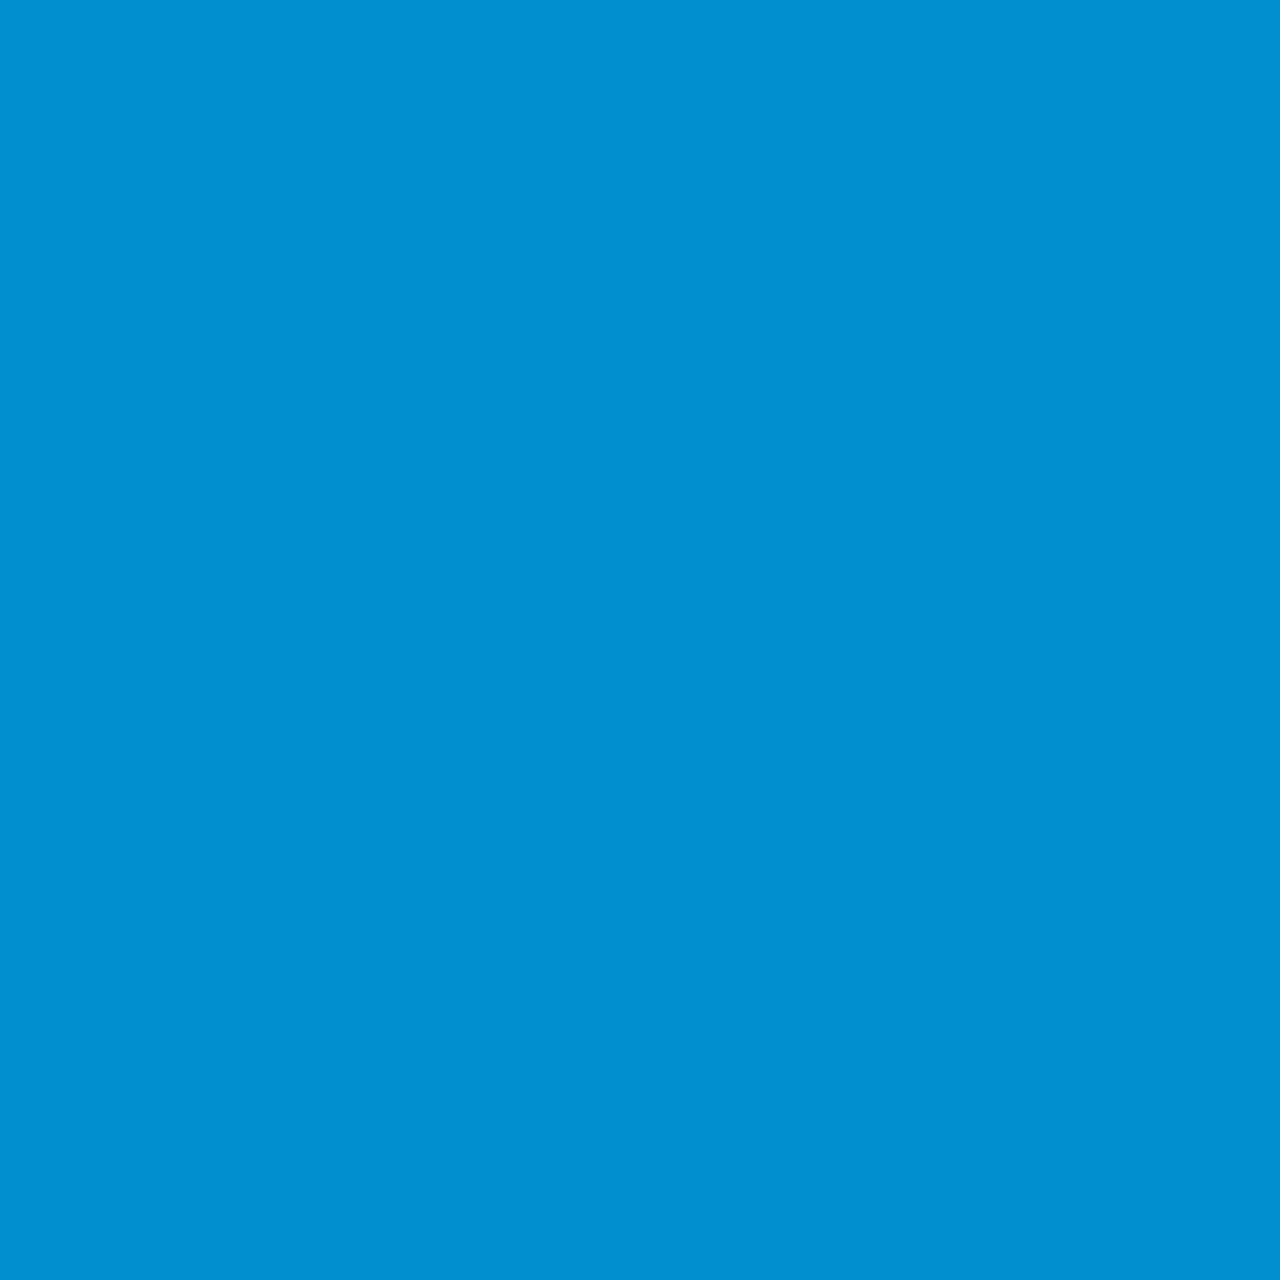 "#0367 Rosco Gels Roscolux Slate Blue, 20x24"""